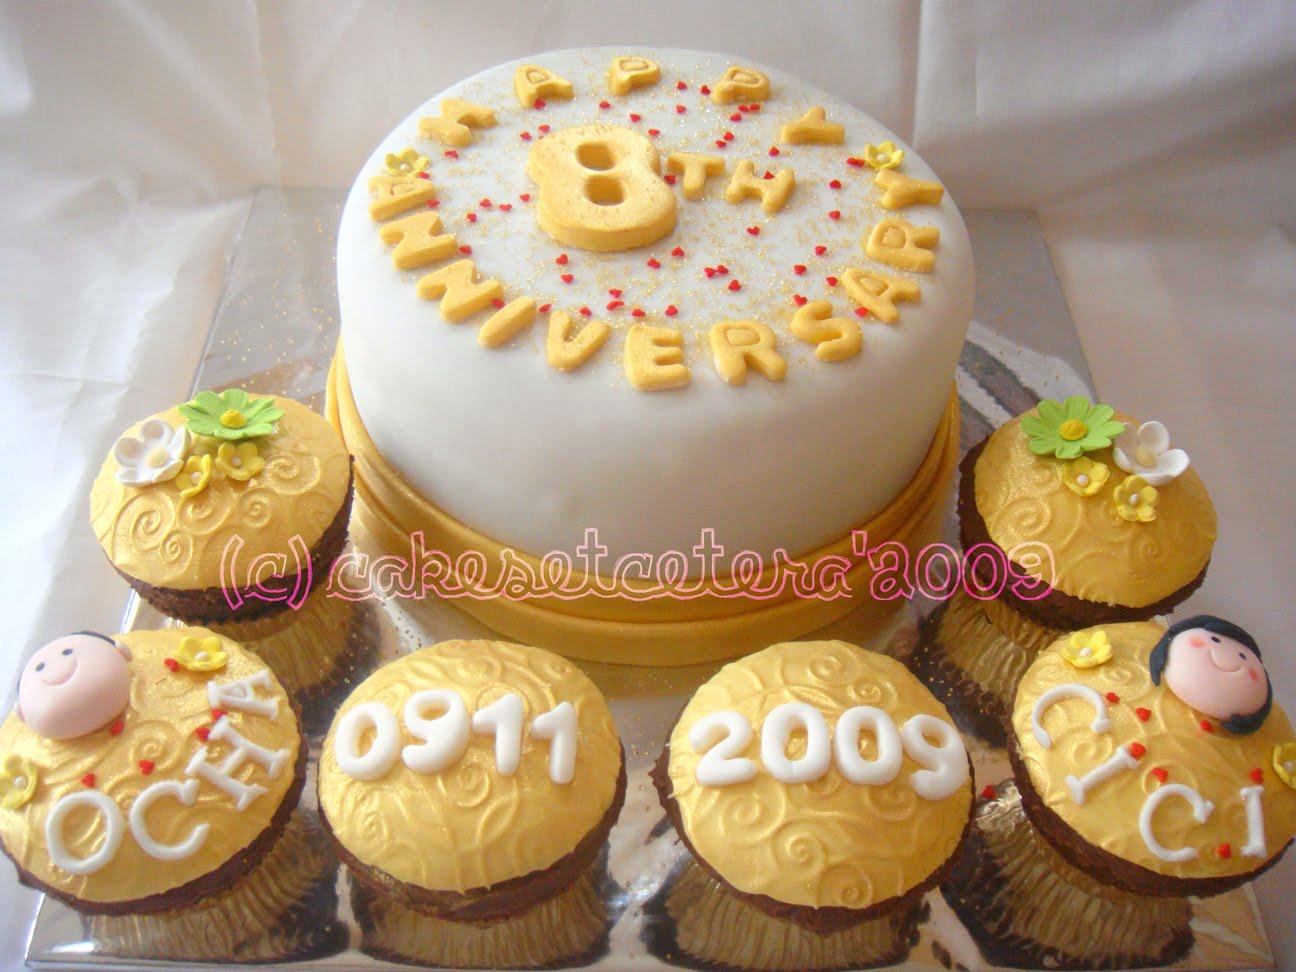 8th Wedding Anniversary Cake 8th Wedding Anniversary Cakes